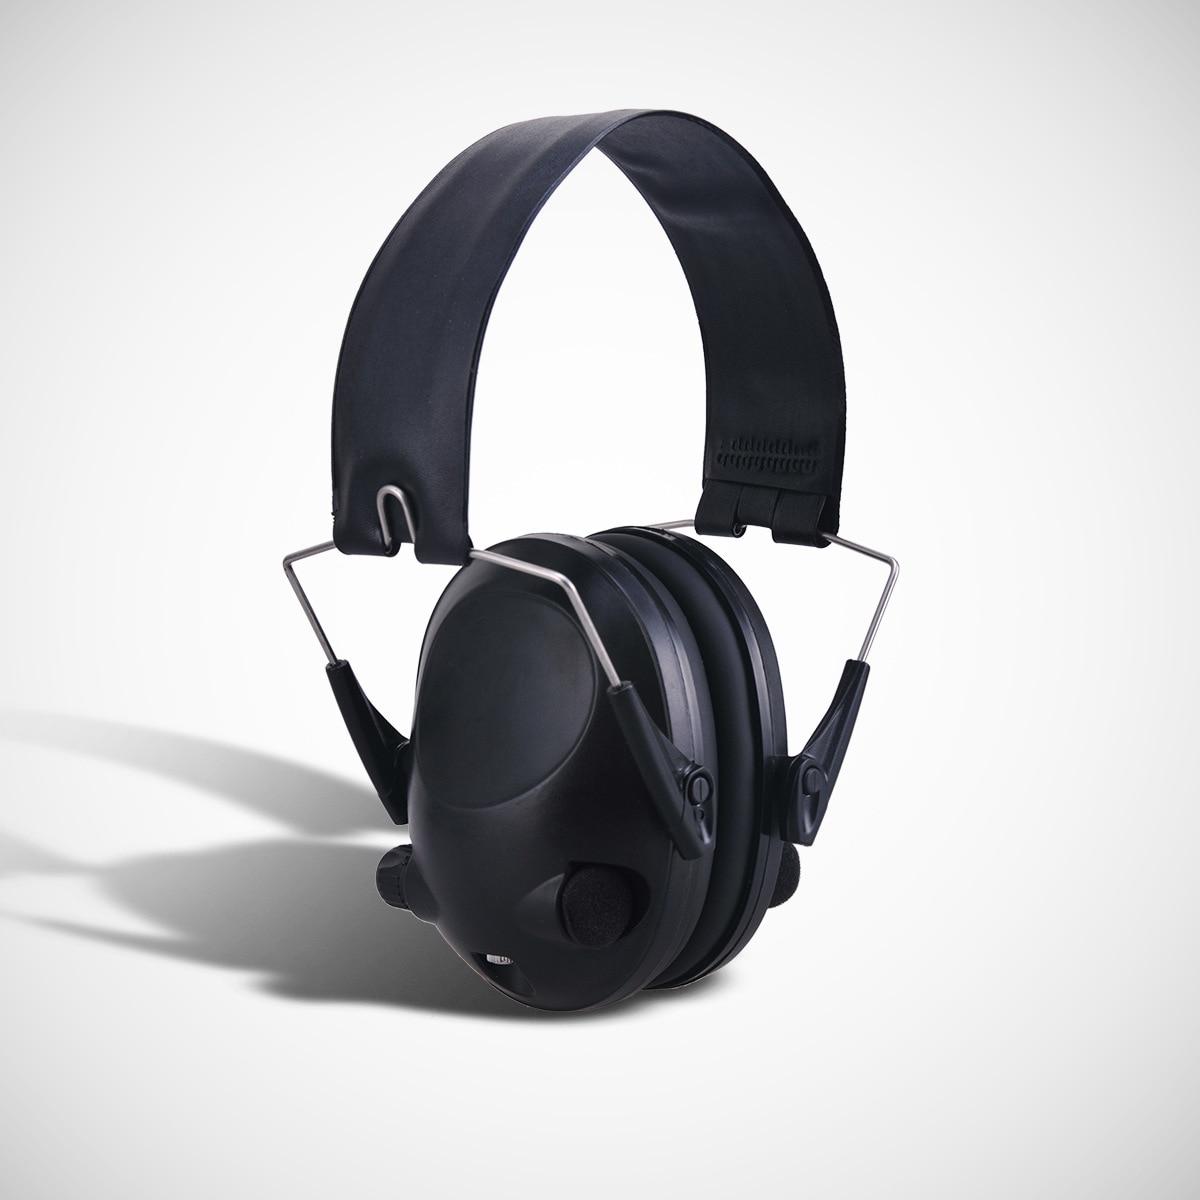 Electronic Ear Protector Impact Earmuff Anti-Noise Earmuffs Fold Ear Hearing Earmuffs Outdoor Hunting Shooting Earmuff 3m h6p3e cap mount earmuffs hearing conservation h6p3e ultra light with liquid foam filled earmuff cushions e111